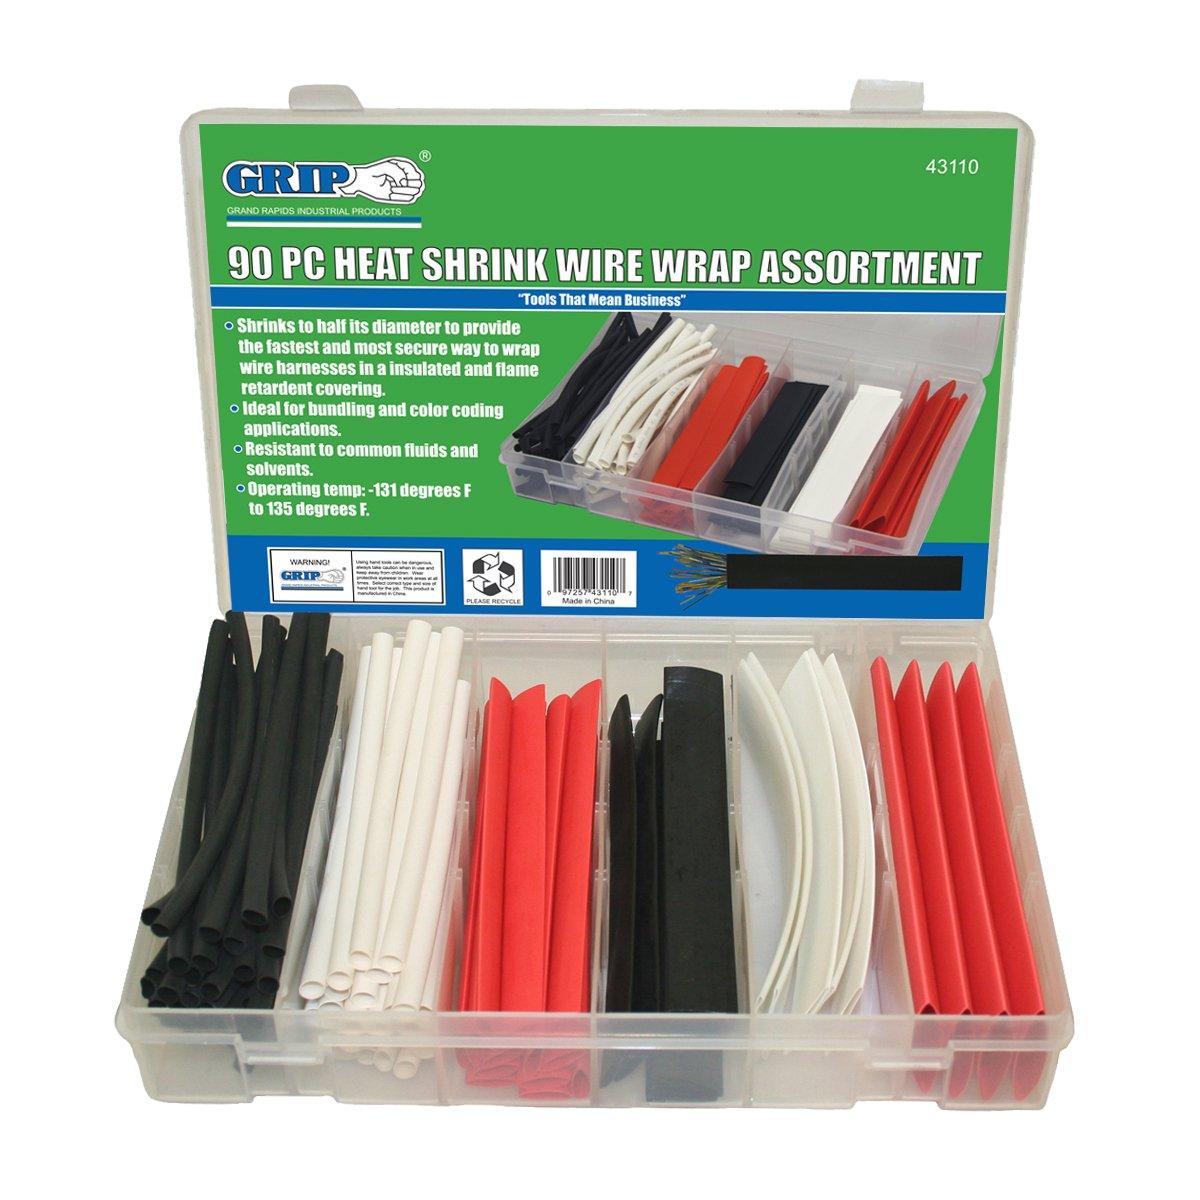 Grip 90 Piece Heat Shrink Wire Wrap Assortment